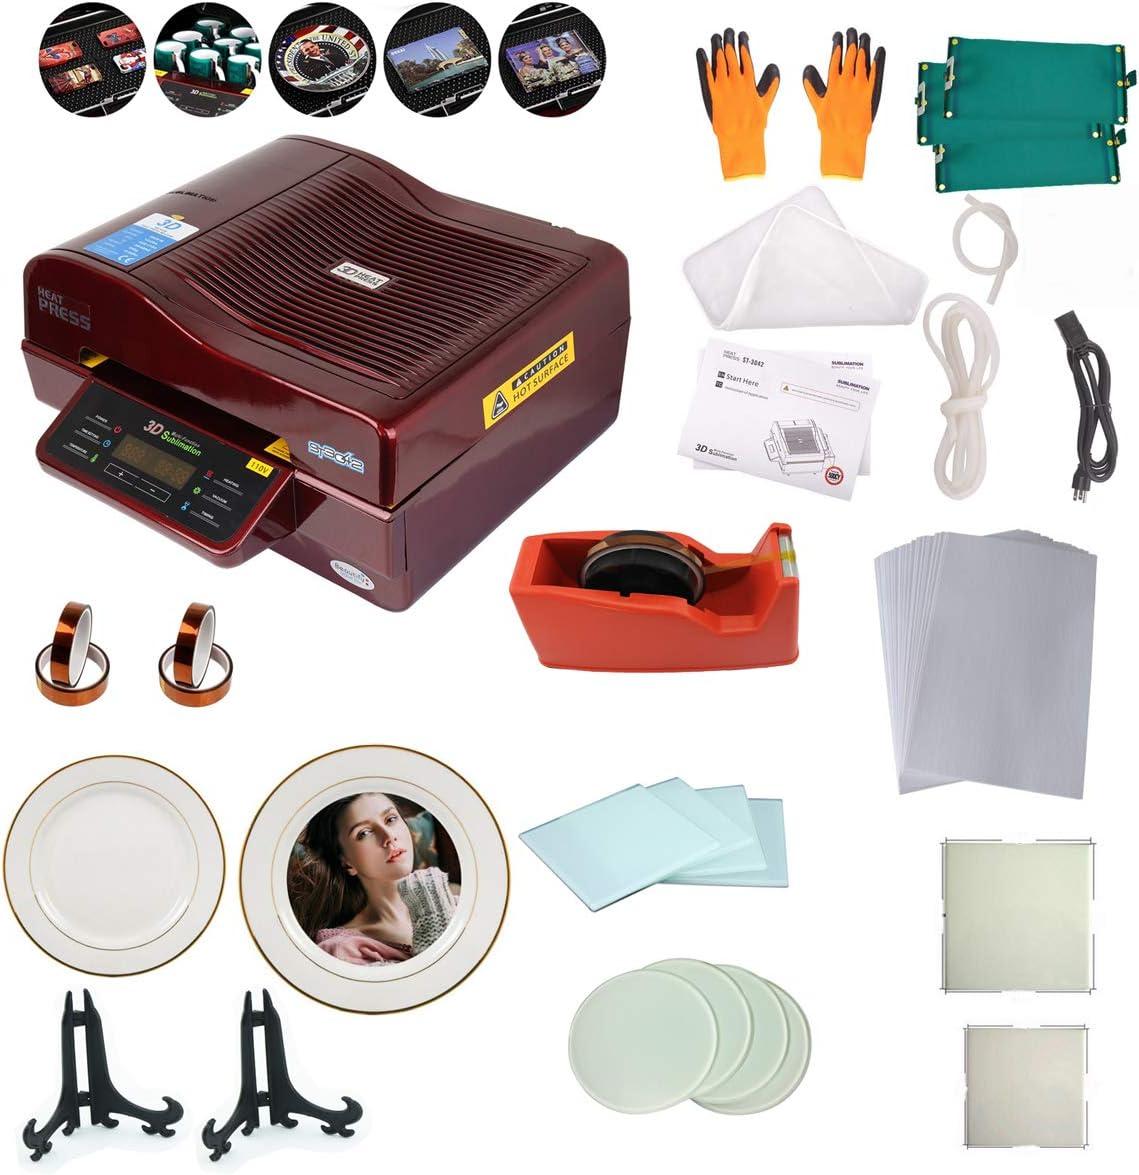 TECHTONGDA 3D Vacuum Sublimation Heat Press Machine Muti-fuction Vacuum Transfer Machine Kit with Plates Tape Cutter Paper Glass Coaster Ceramic Tile 110V